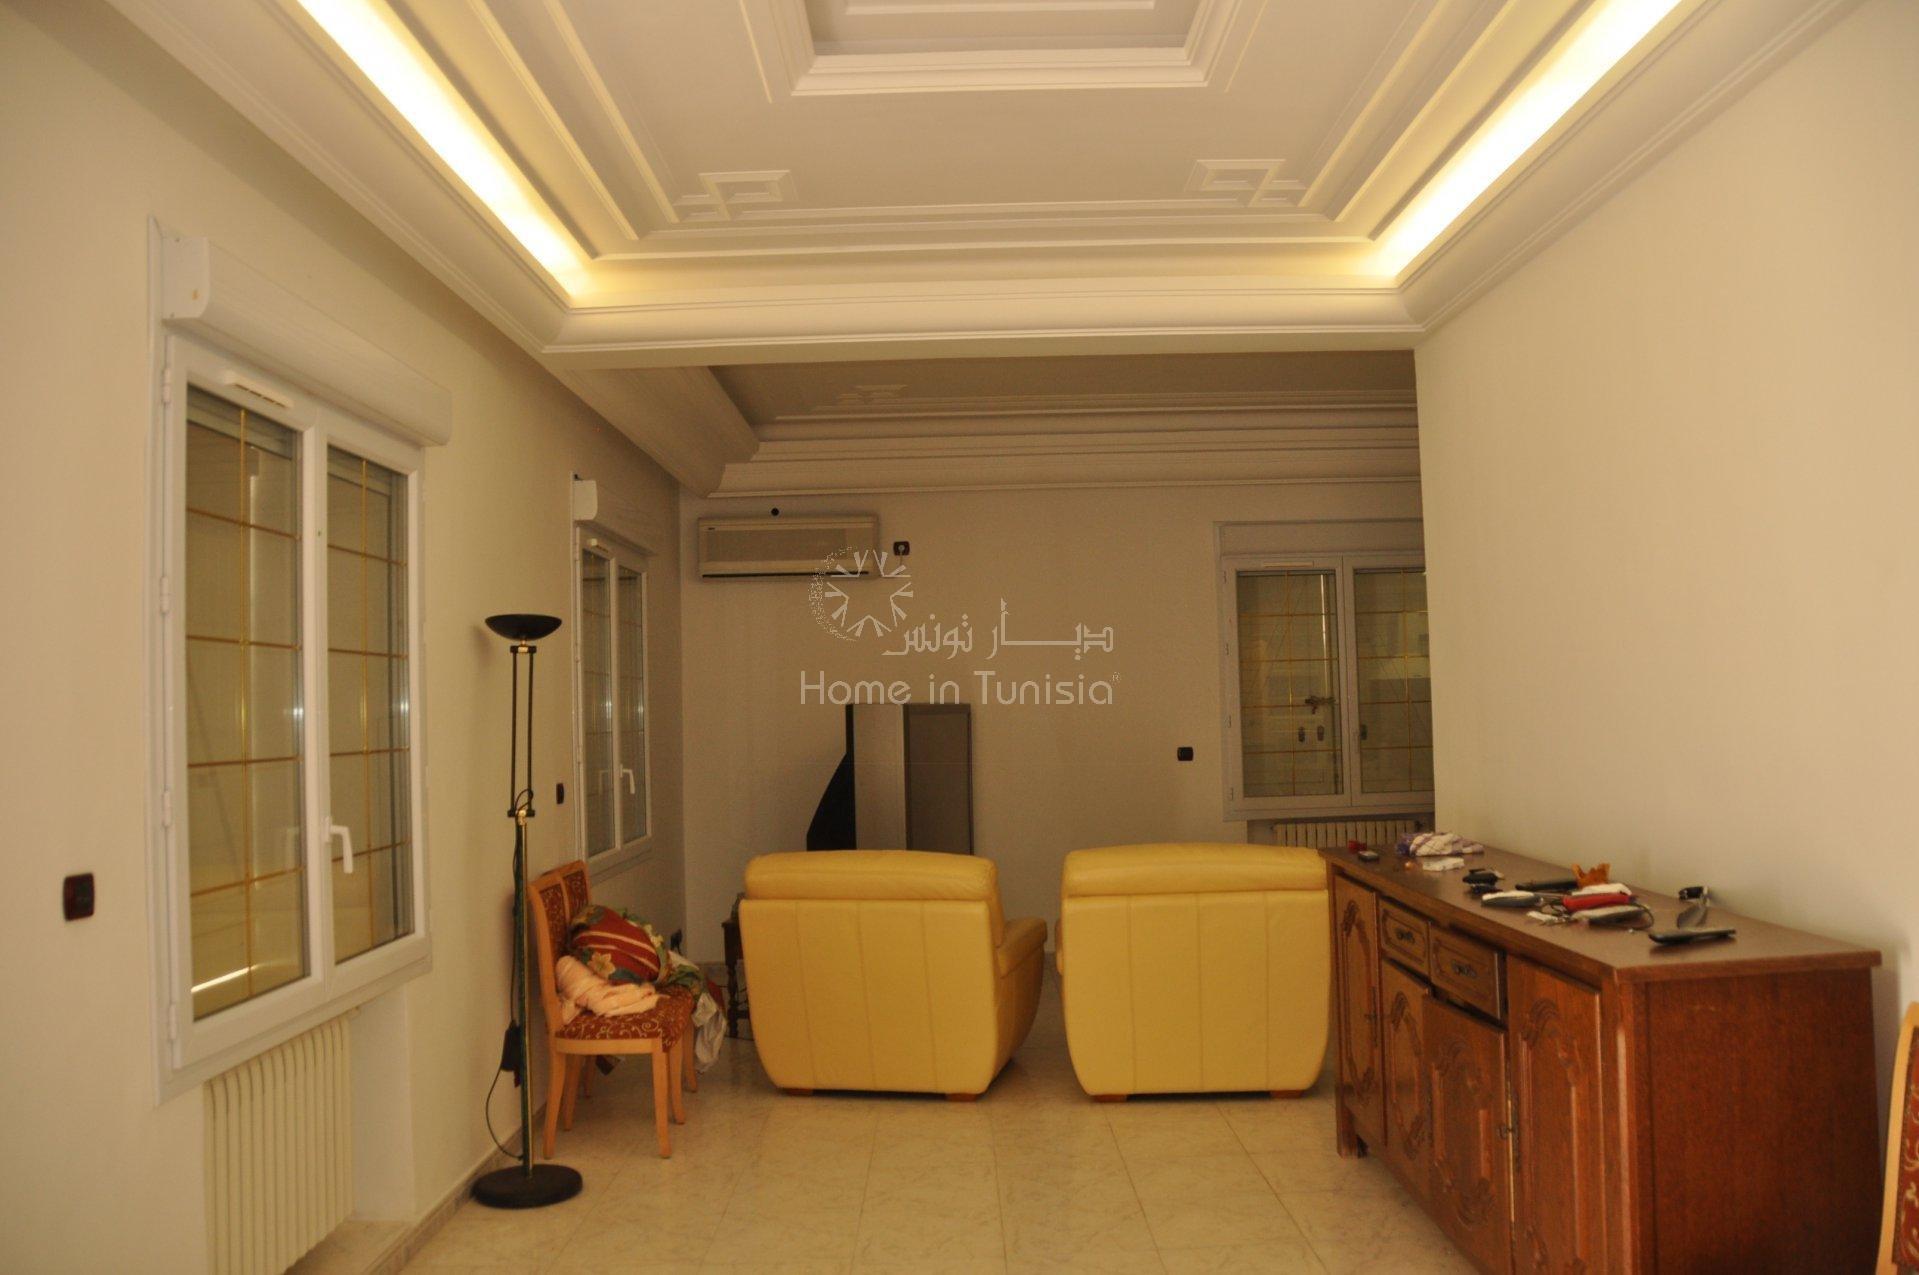 Vente Maison - Ksibet Sousse - Tunisie